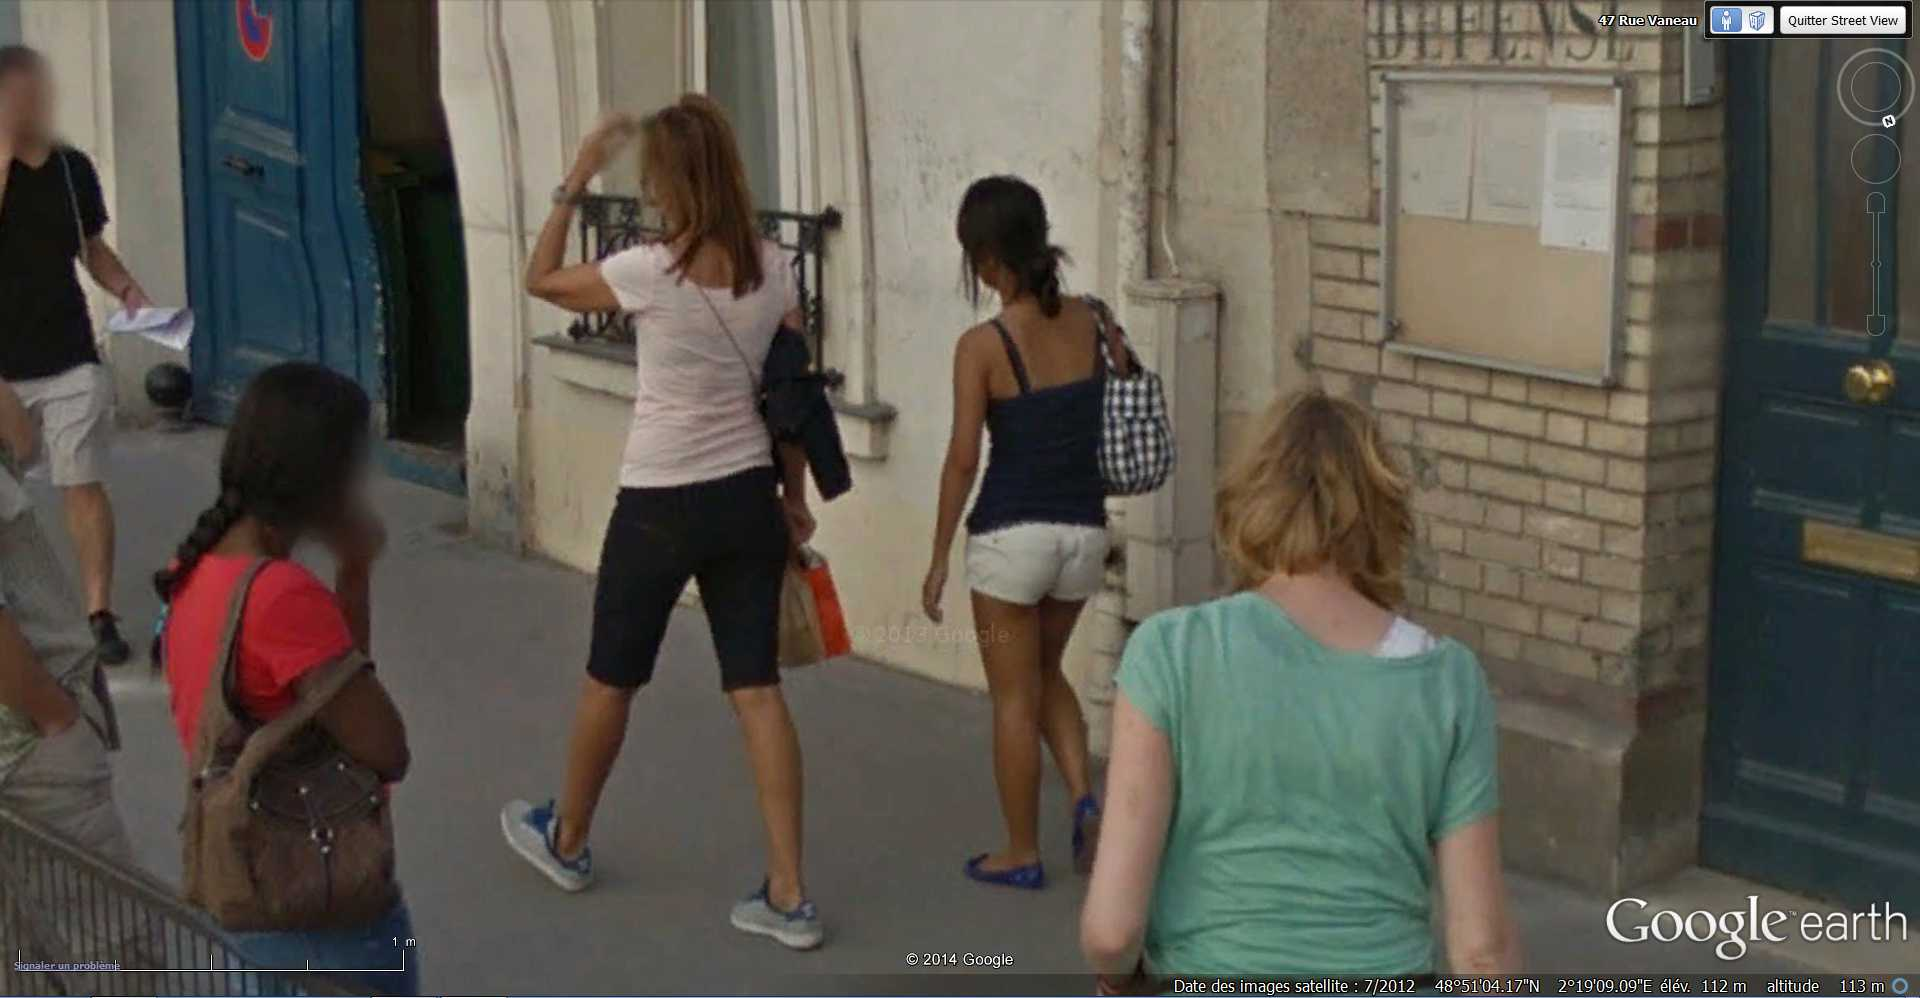 STREET VIEW : Chute de moto - rue Vaneau - Paris - France  2014-321